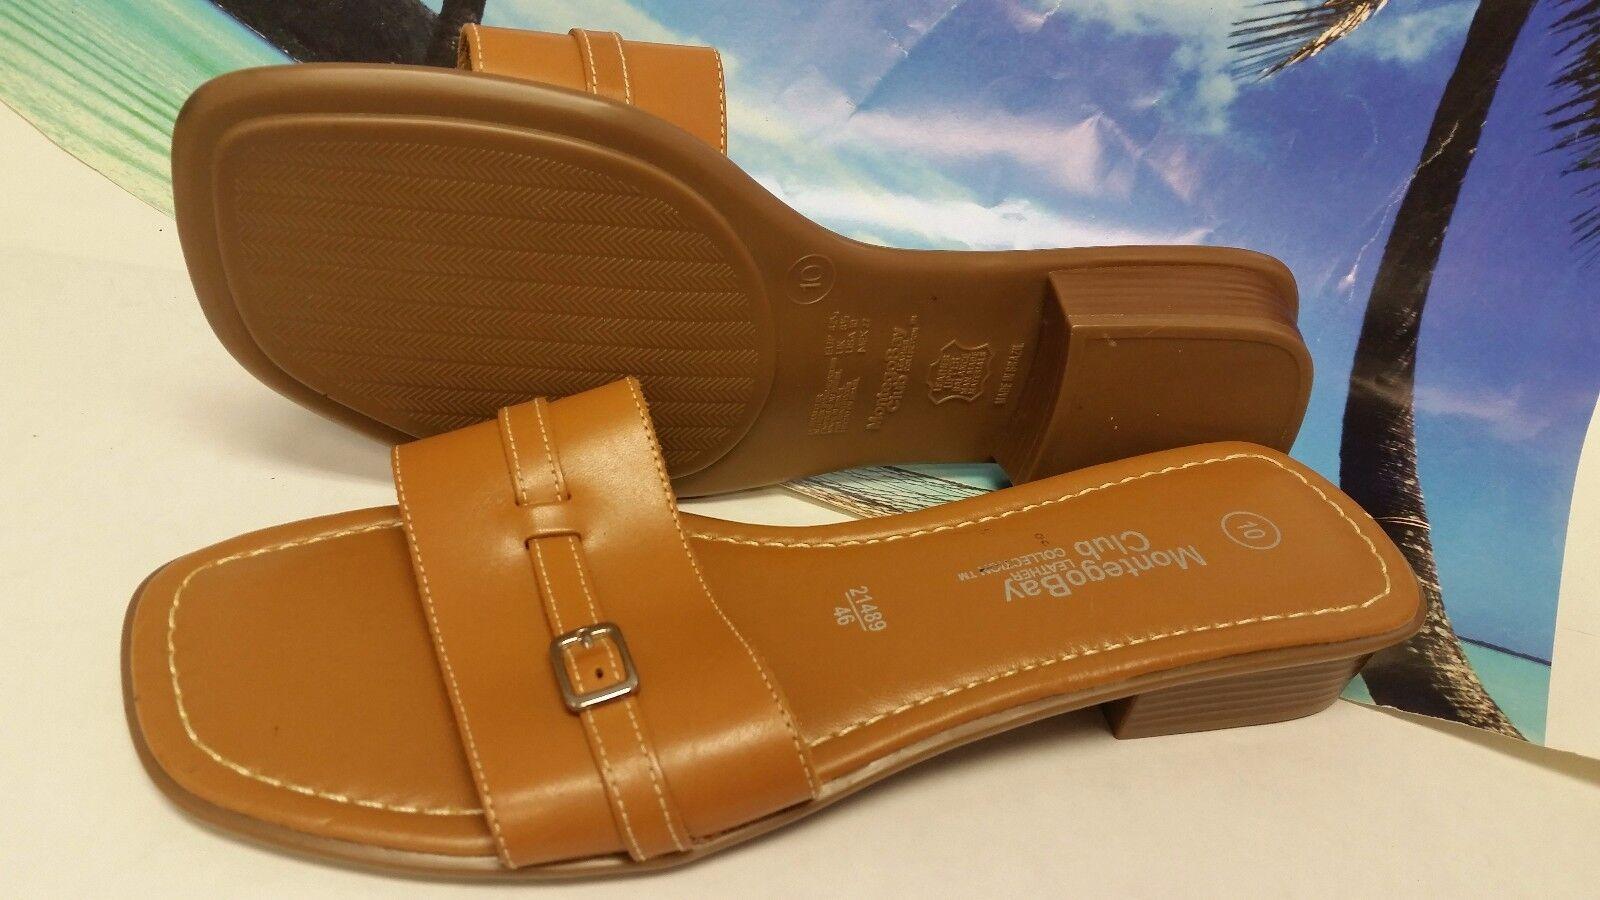 WOMEN'S MONTEGO BAY CLUB Open Toe Brown Sandals SZ 10 EUC!!